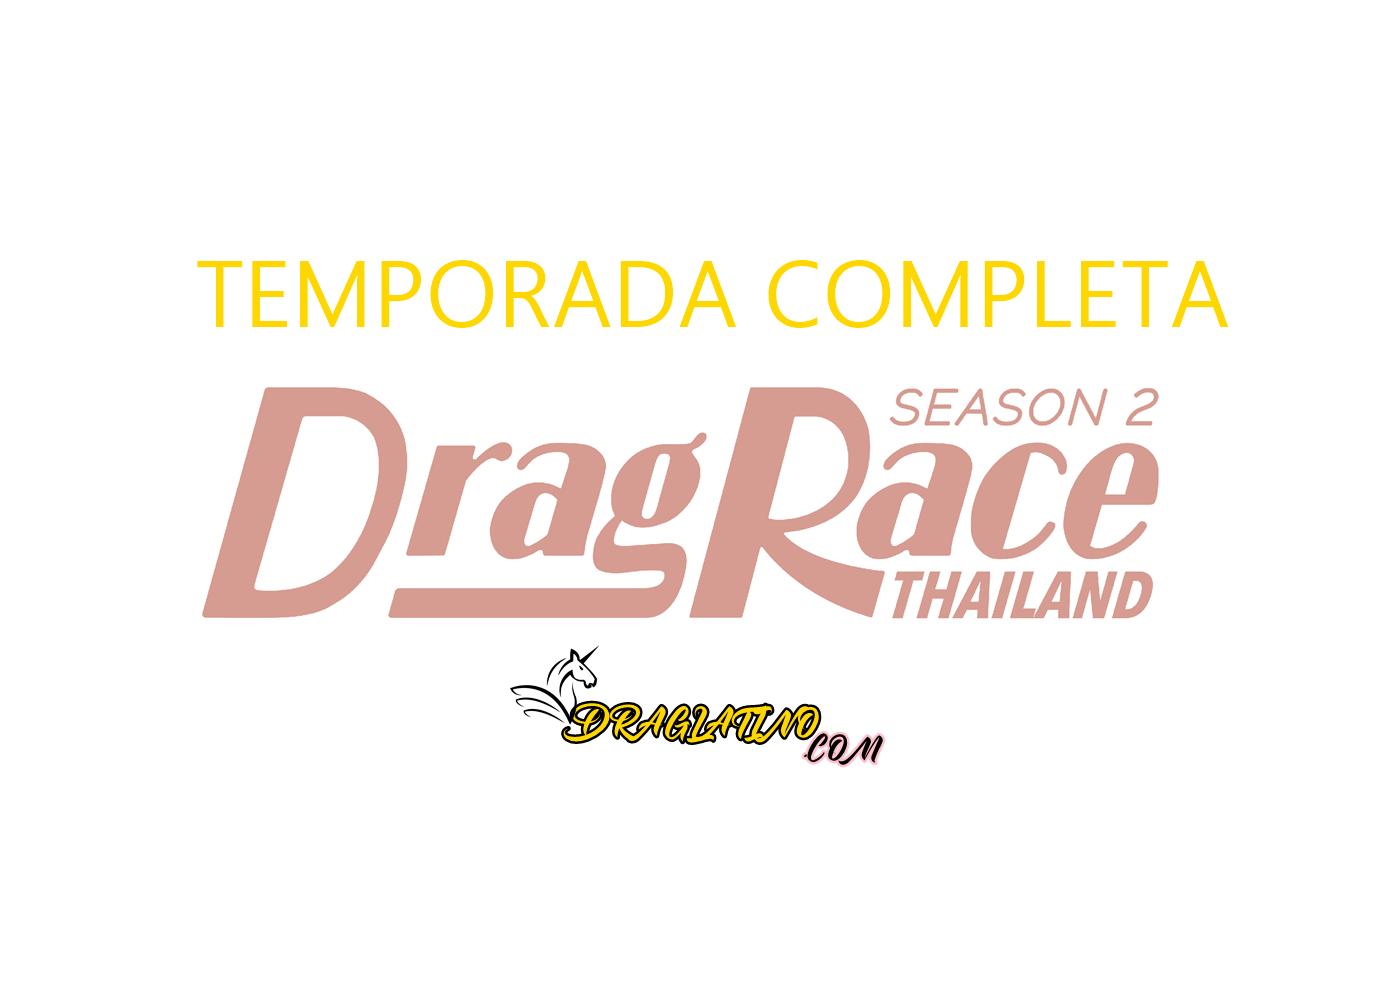 DRAG RACE THAILAND 2 ESPAÑOL TEMPORADA COMPLETA